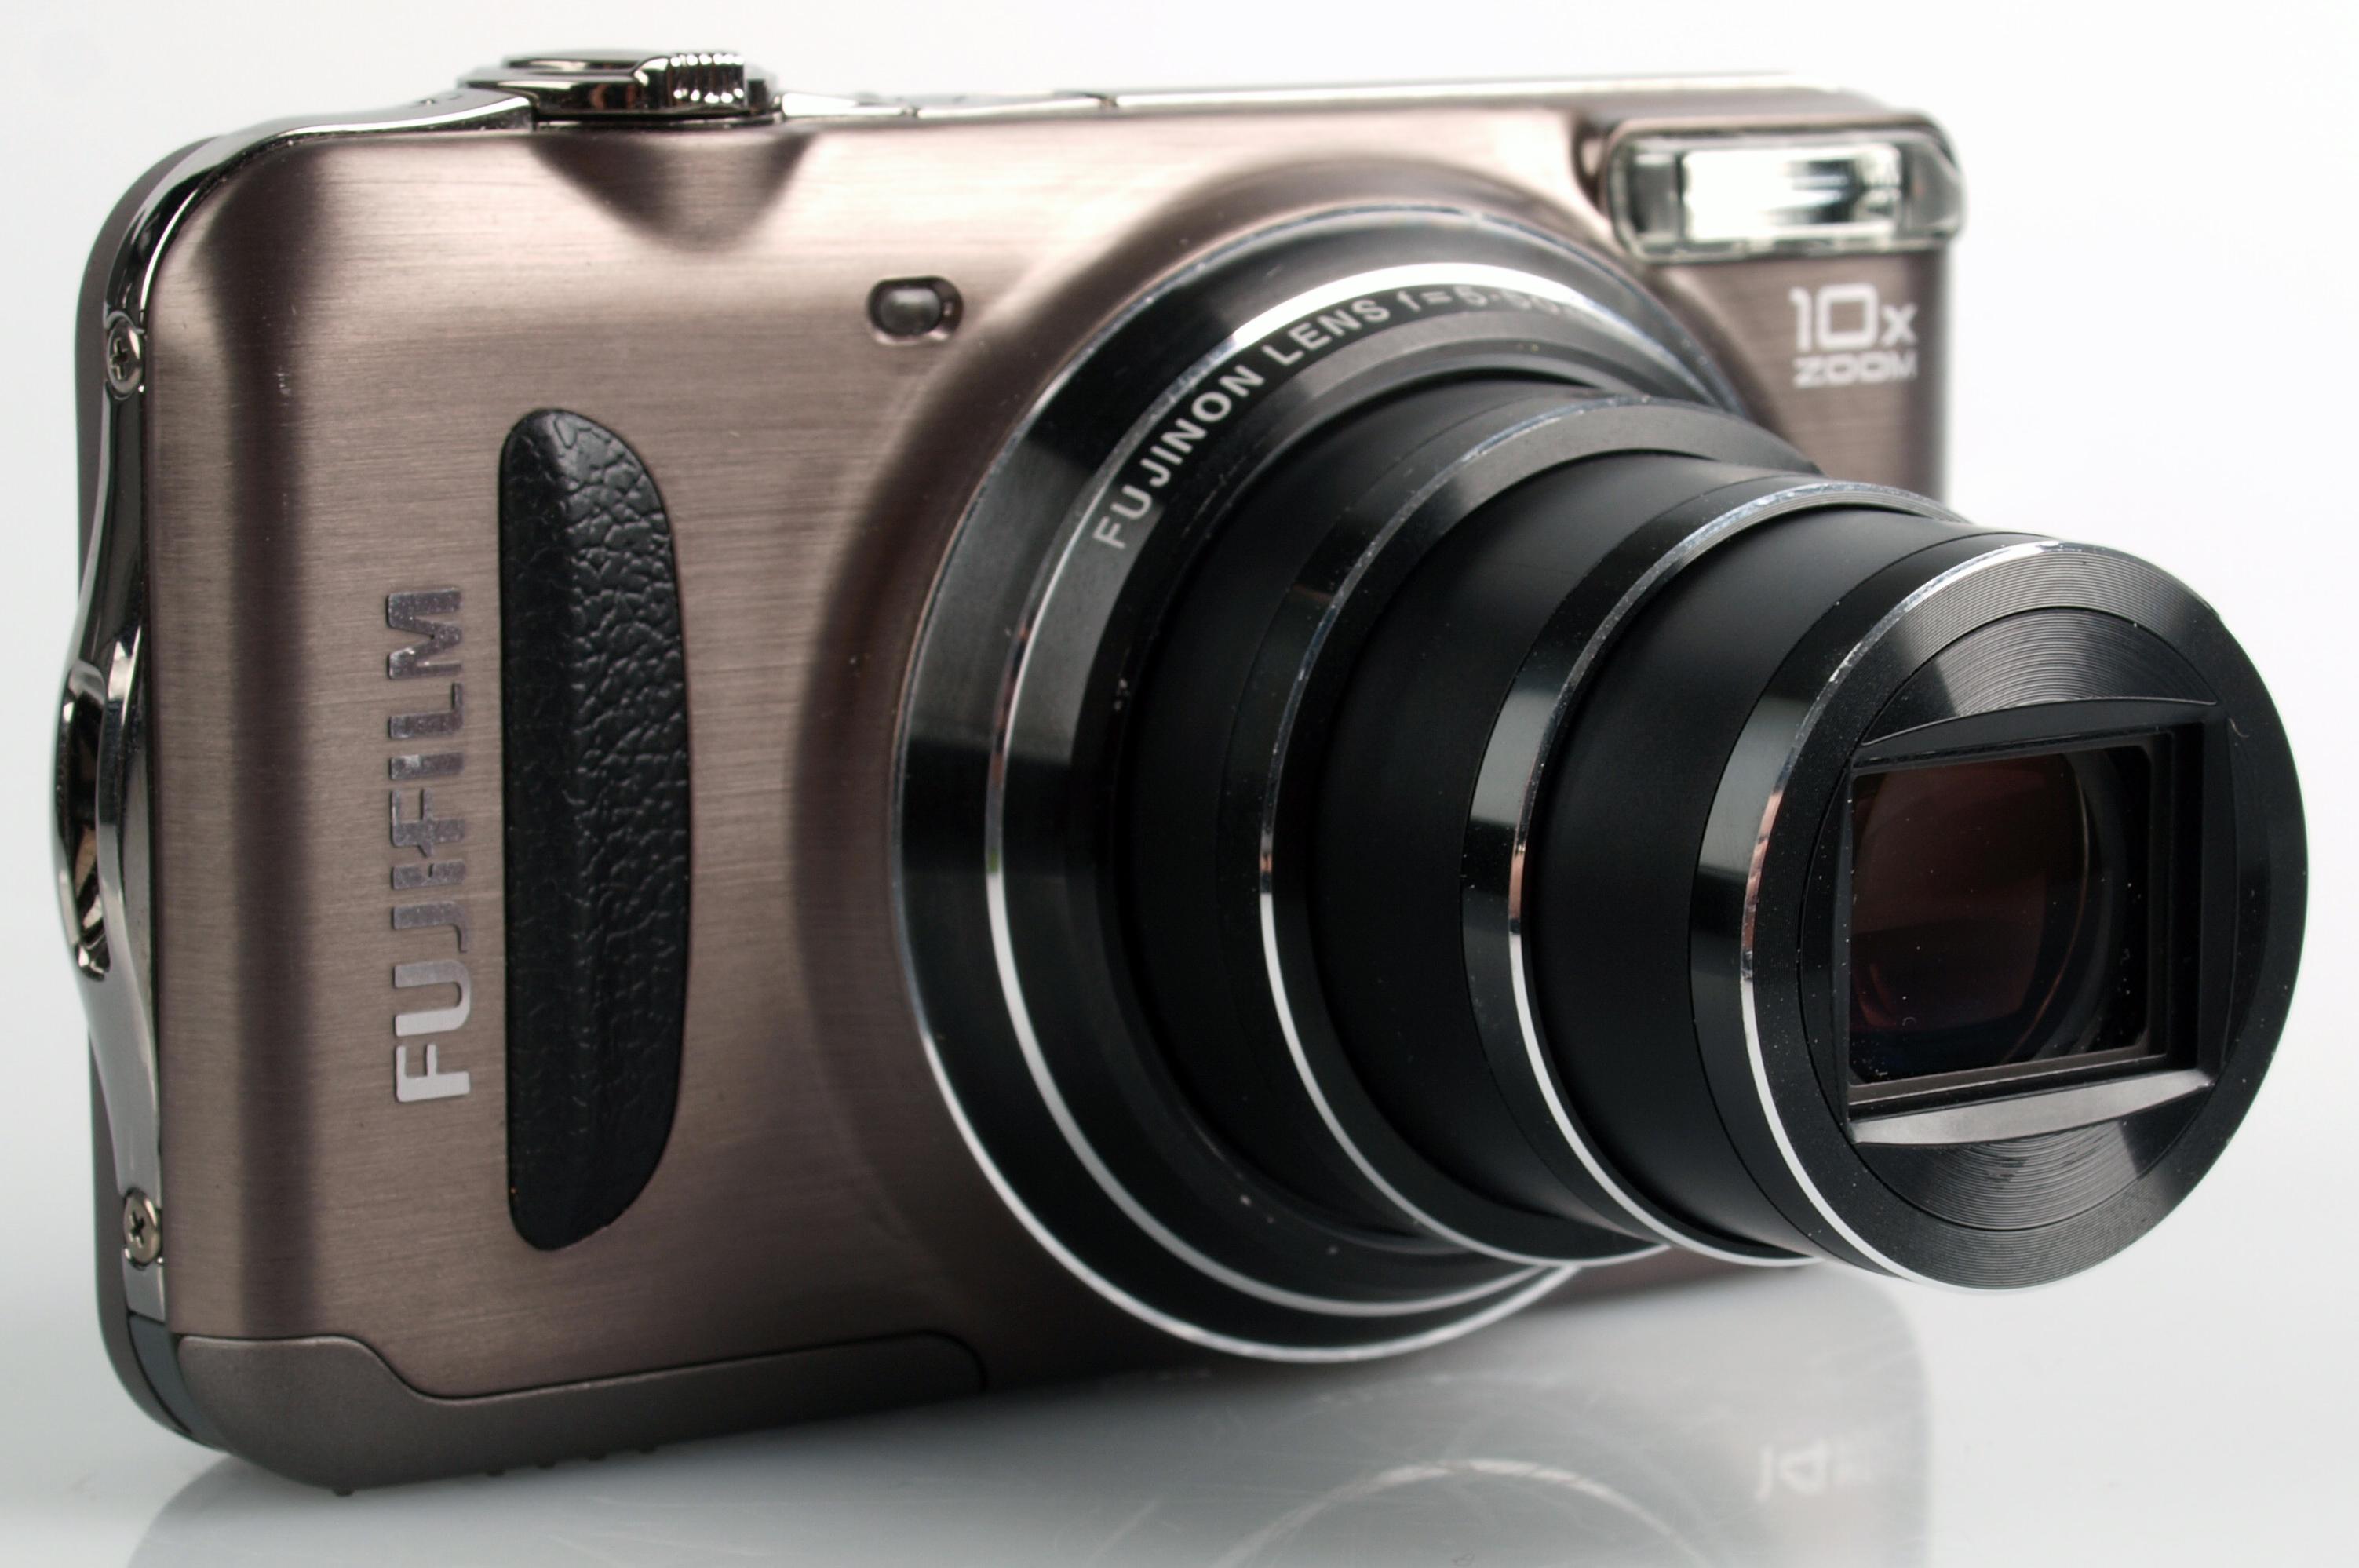 Lens extended | 1/200 sec | f/11.0 | 35.0 mm | ISO Lens extended. The Fujifilm  FinePix T200 ...